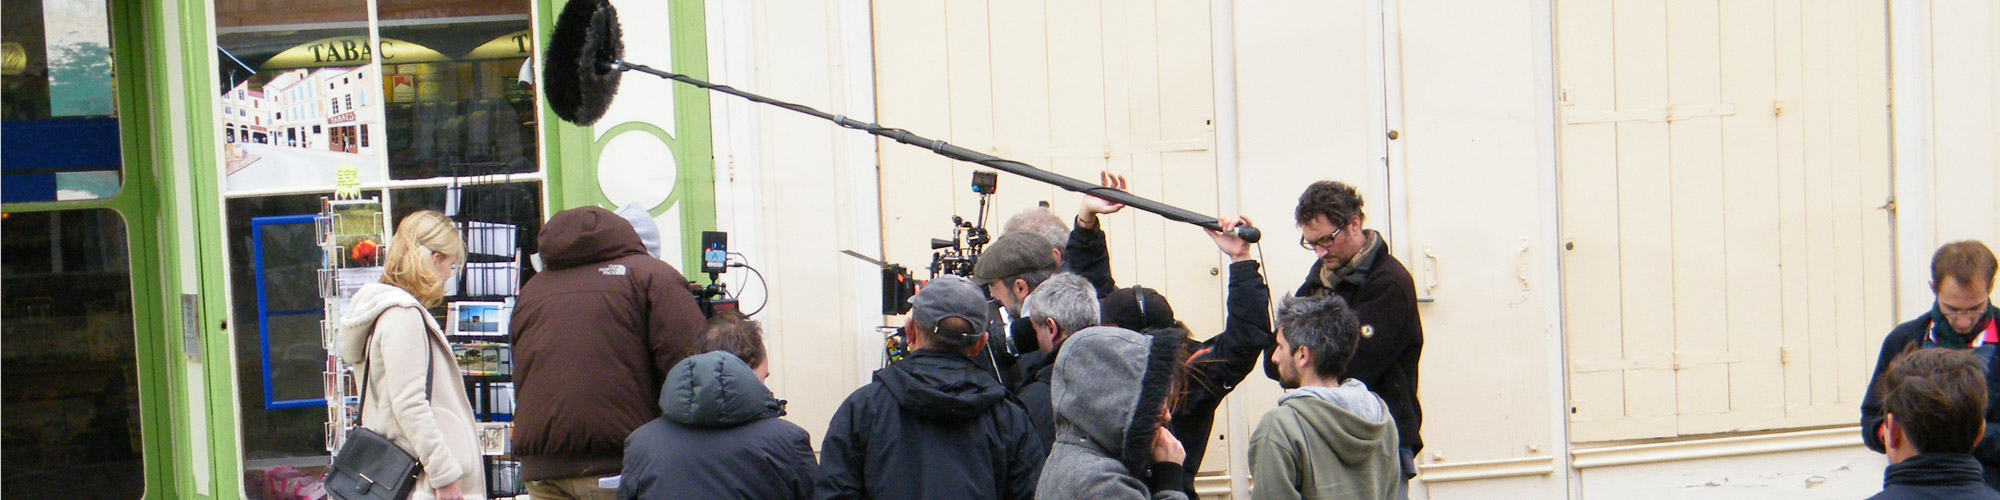 Bourg-gironde-tournage-film